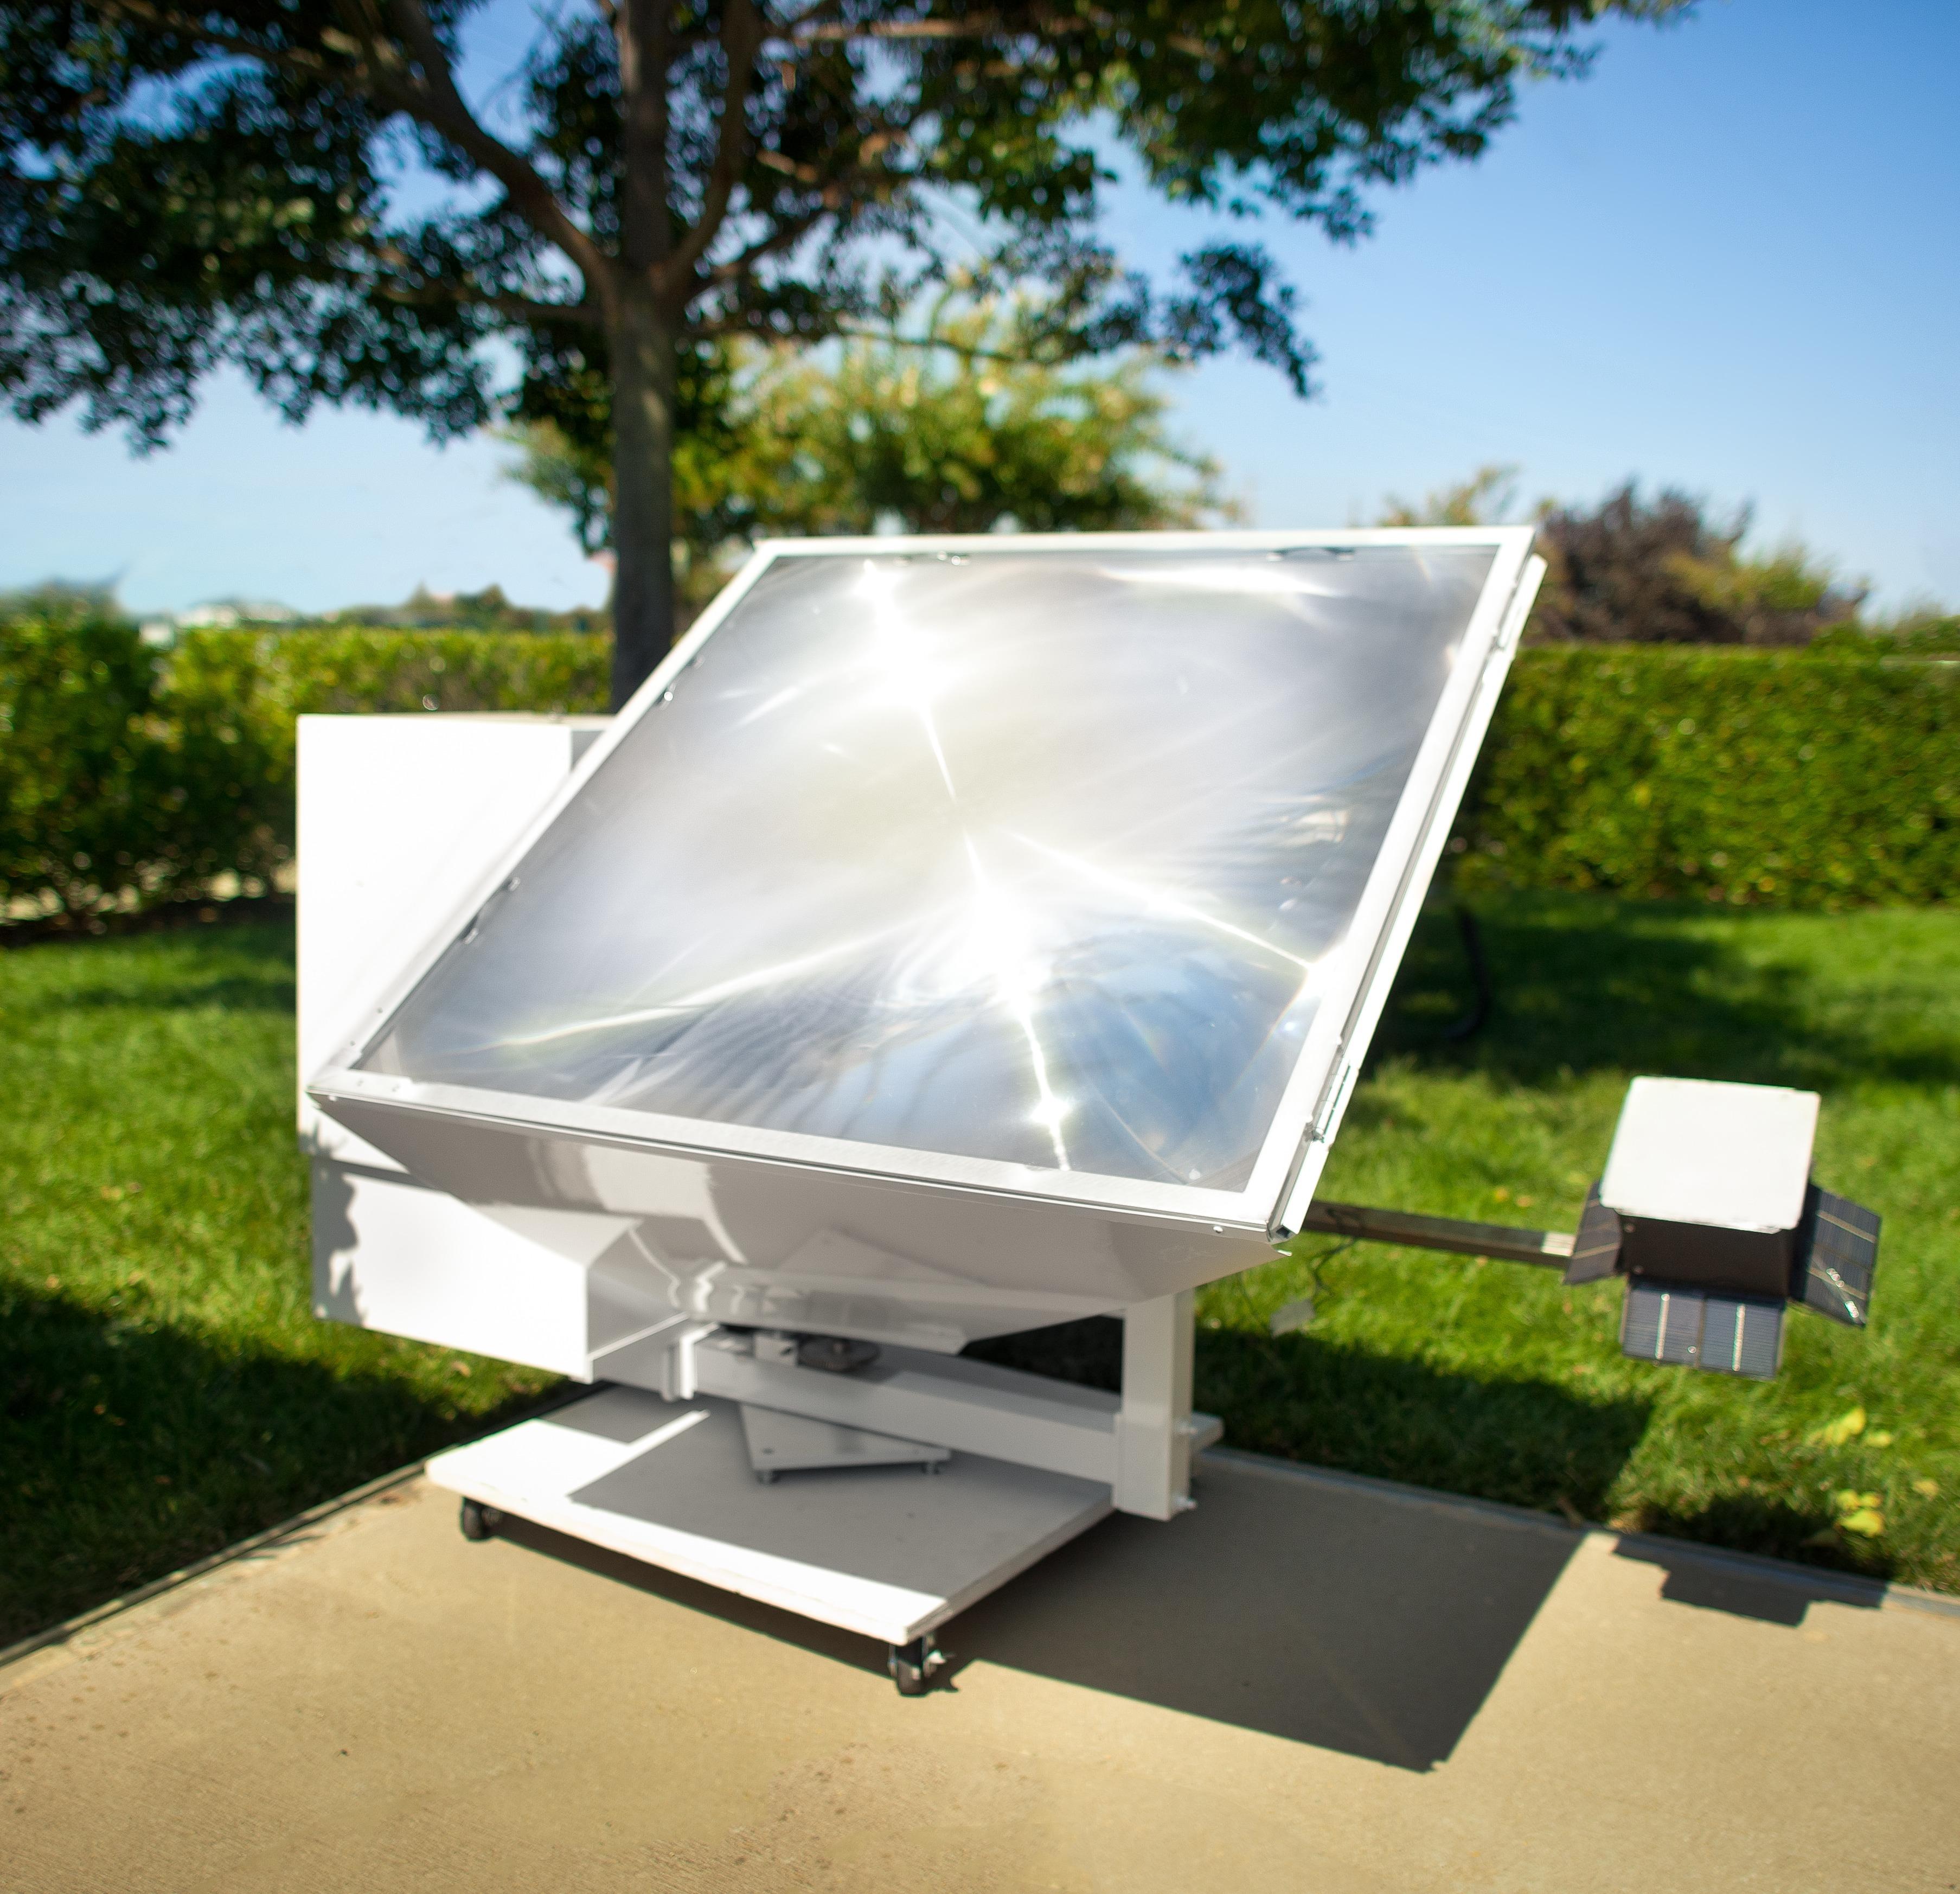 California Sunlight Solar Cooker